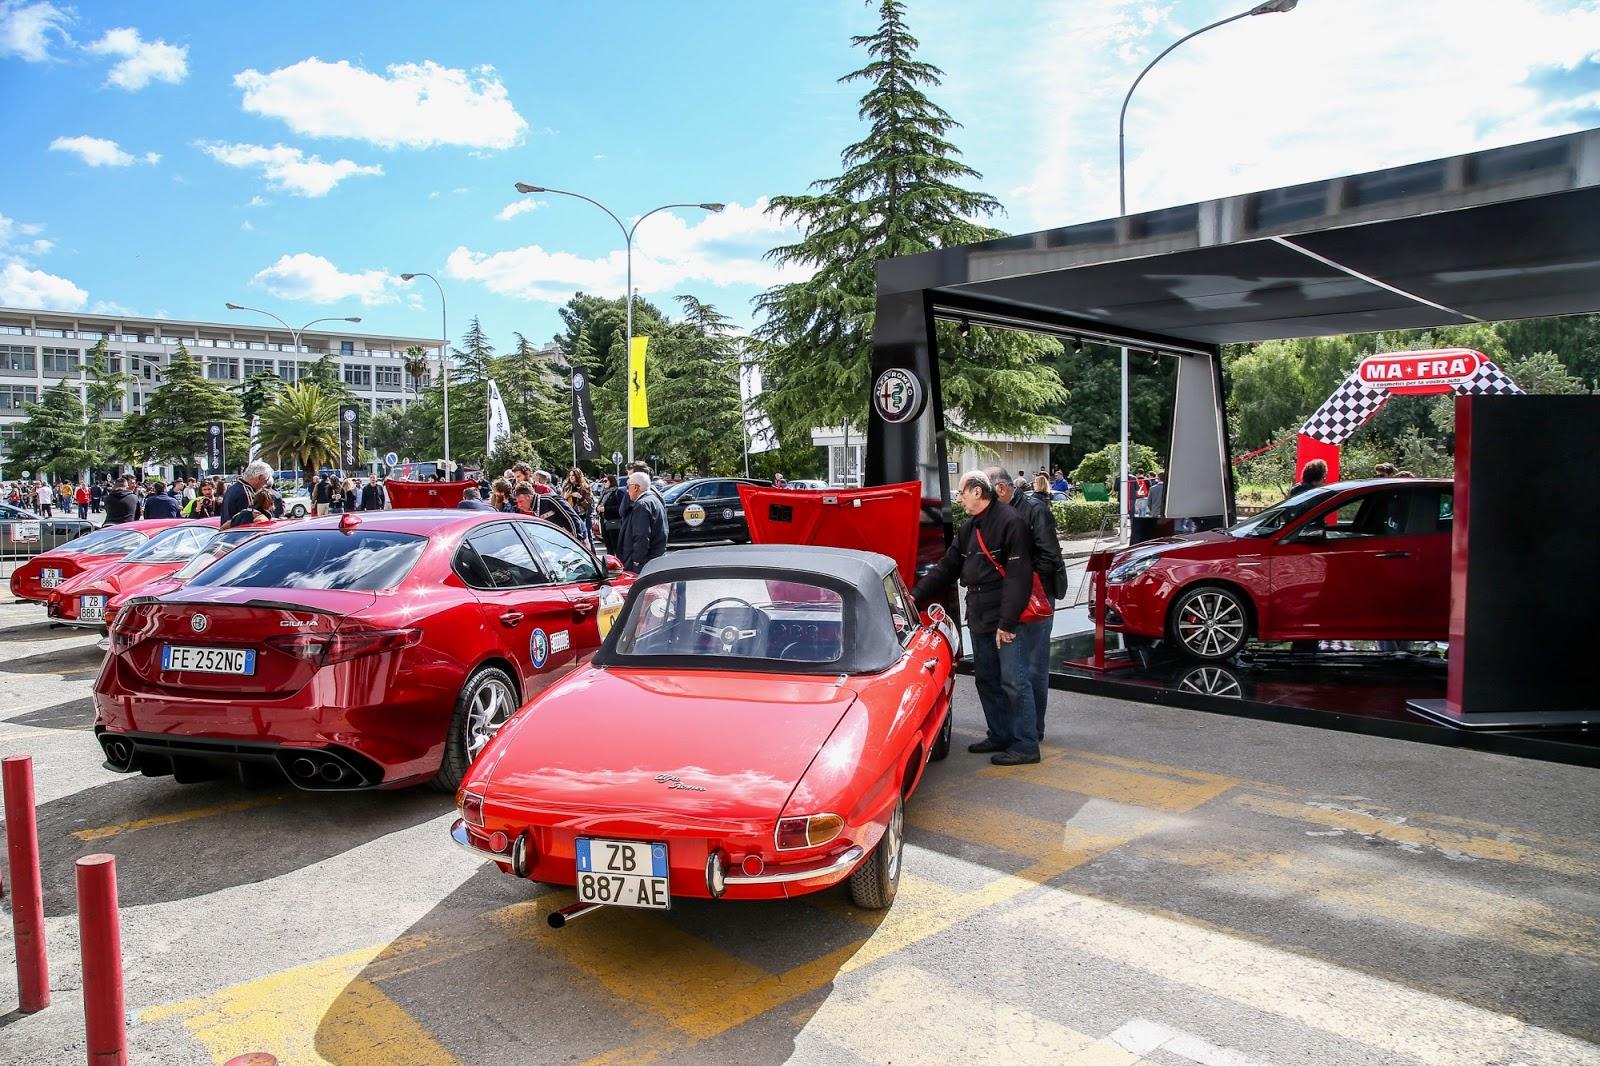 170420 Alfa Romeo On Air 05 H 1960 Giulietta SZ στο 101ο Targa Florio Alfa, alfa romeo, Alfa Romeo Giulietta, Alfa Romeo Giulietta SZ, Classic, Targa Florio, videos, αγωνες